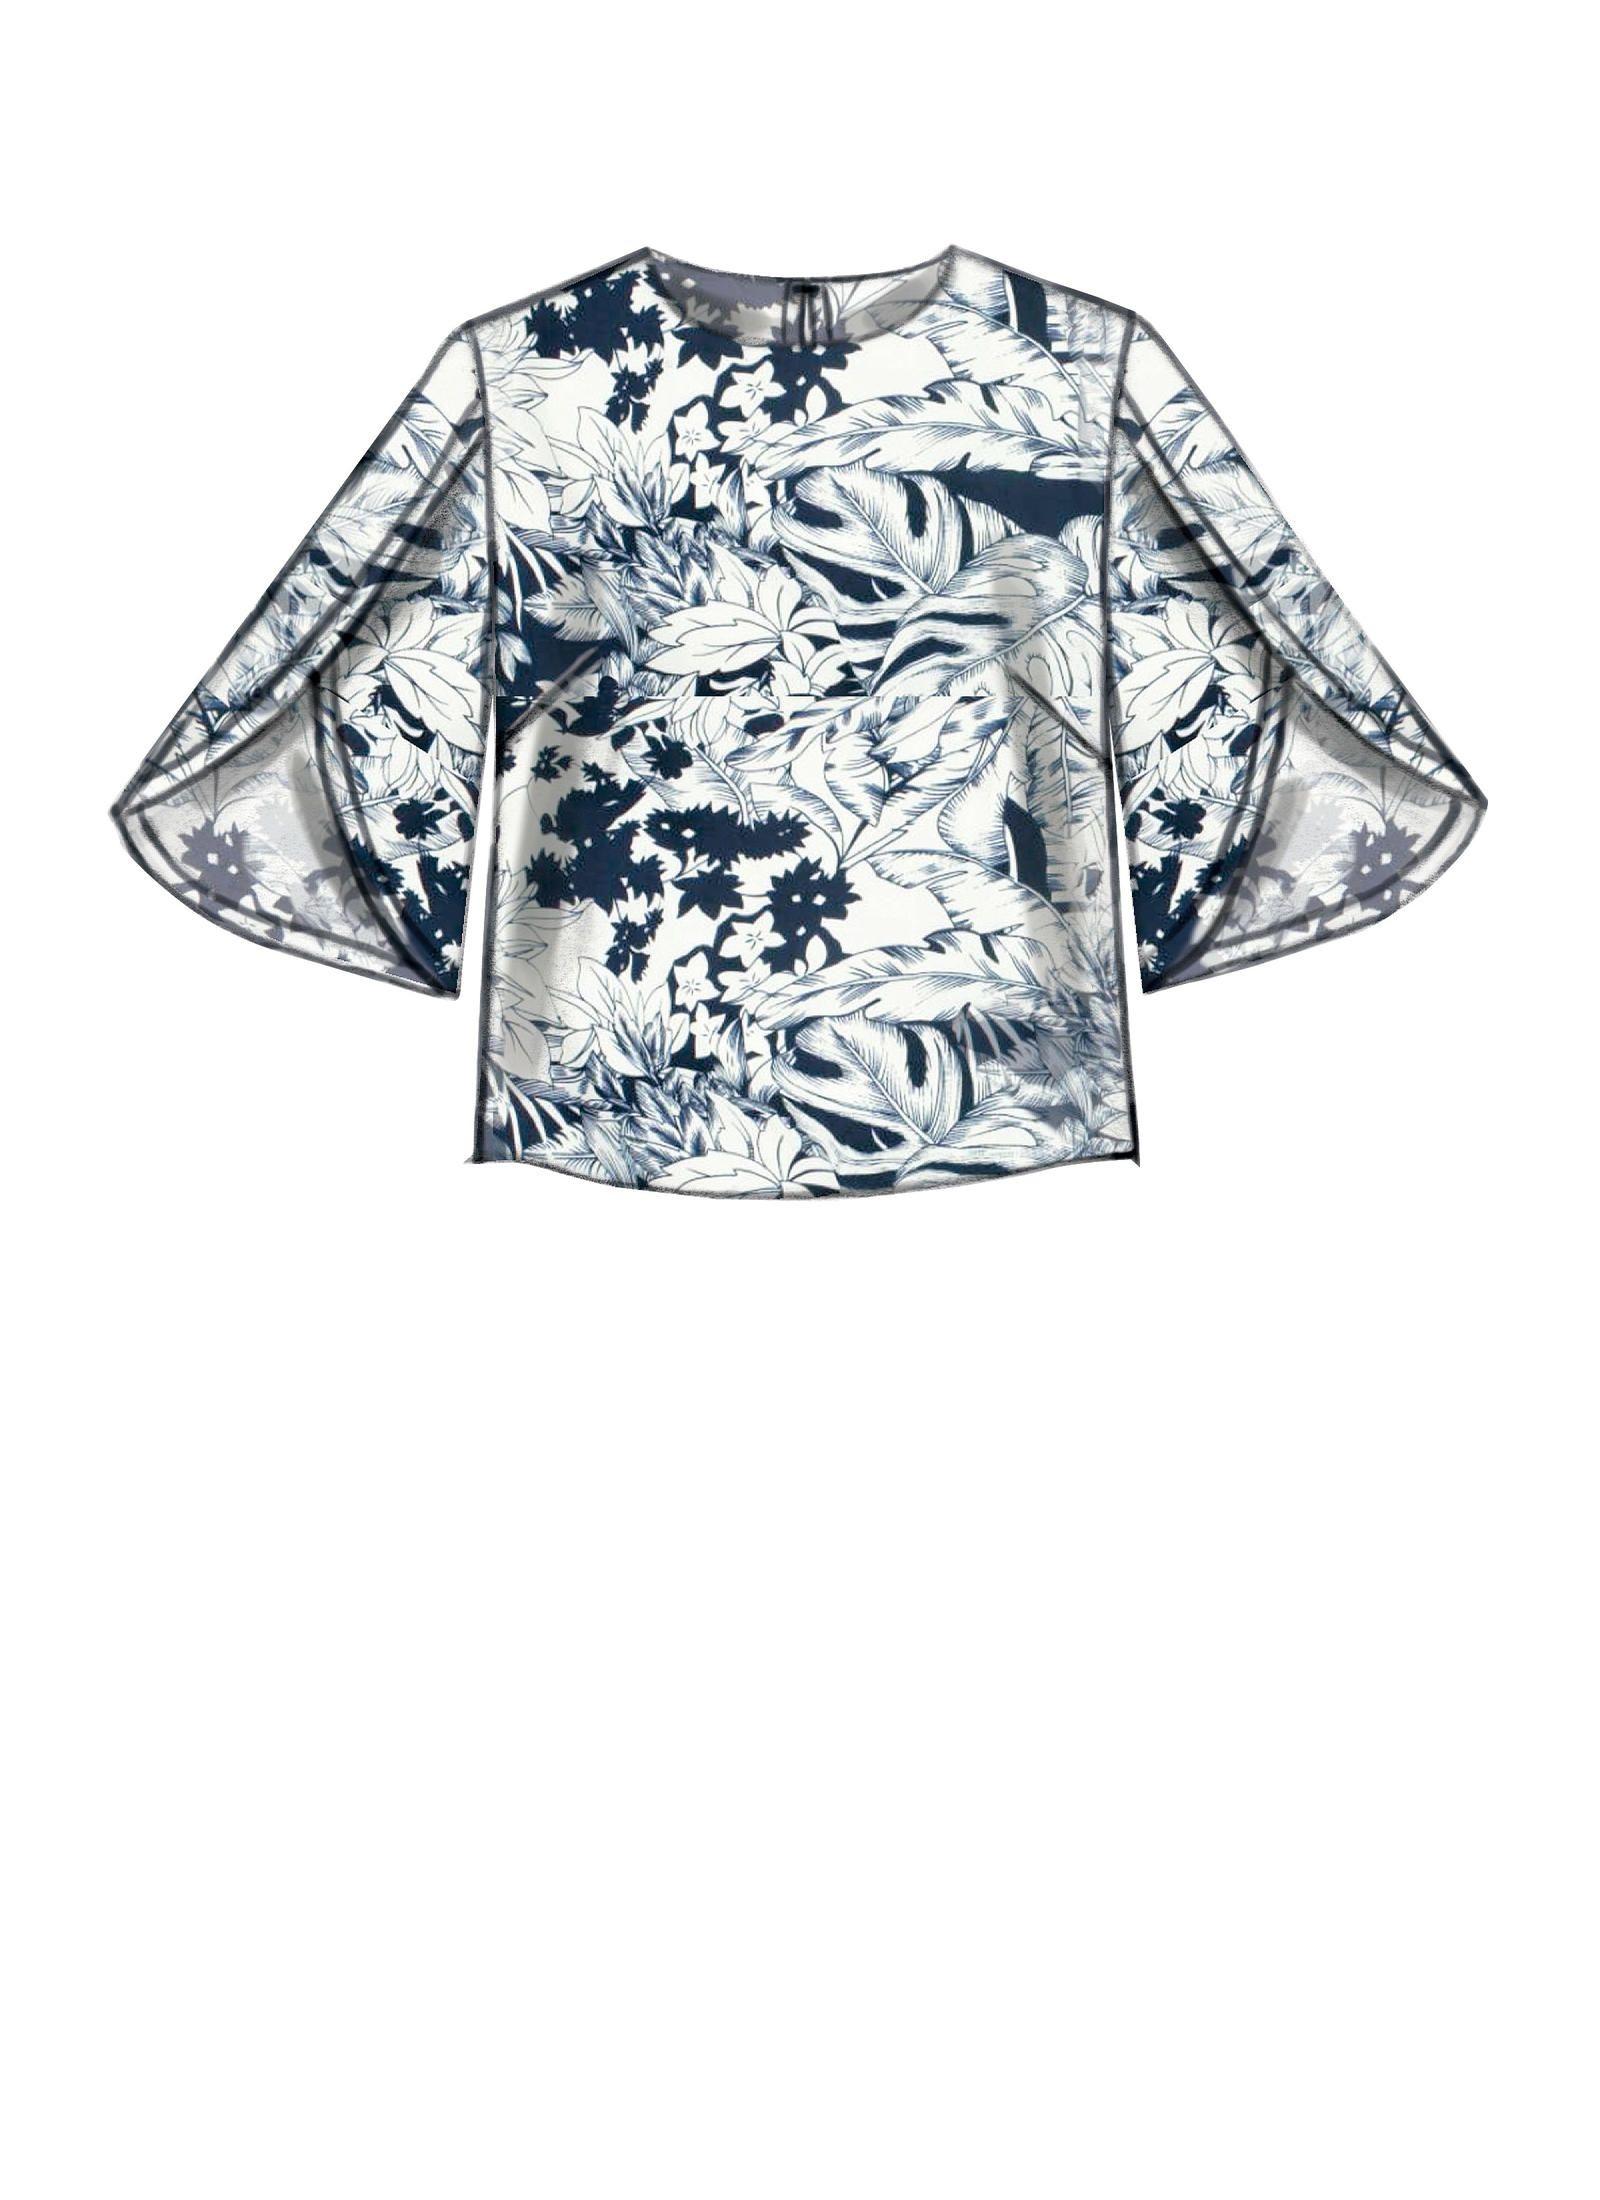 M7542 mccalls patterns sew clothes pinterest sewing m7542 mccalls patterns jeuxipadfo Images